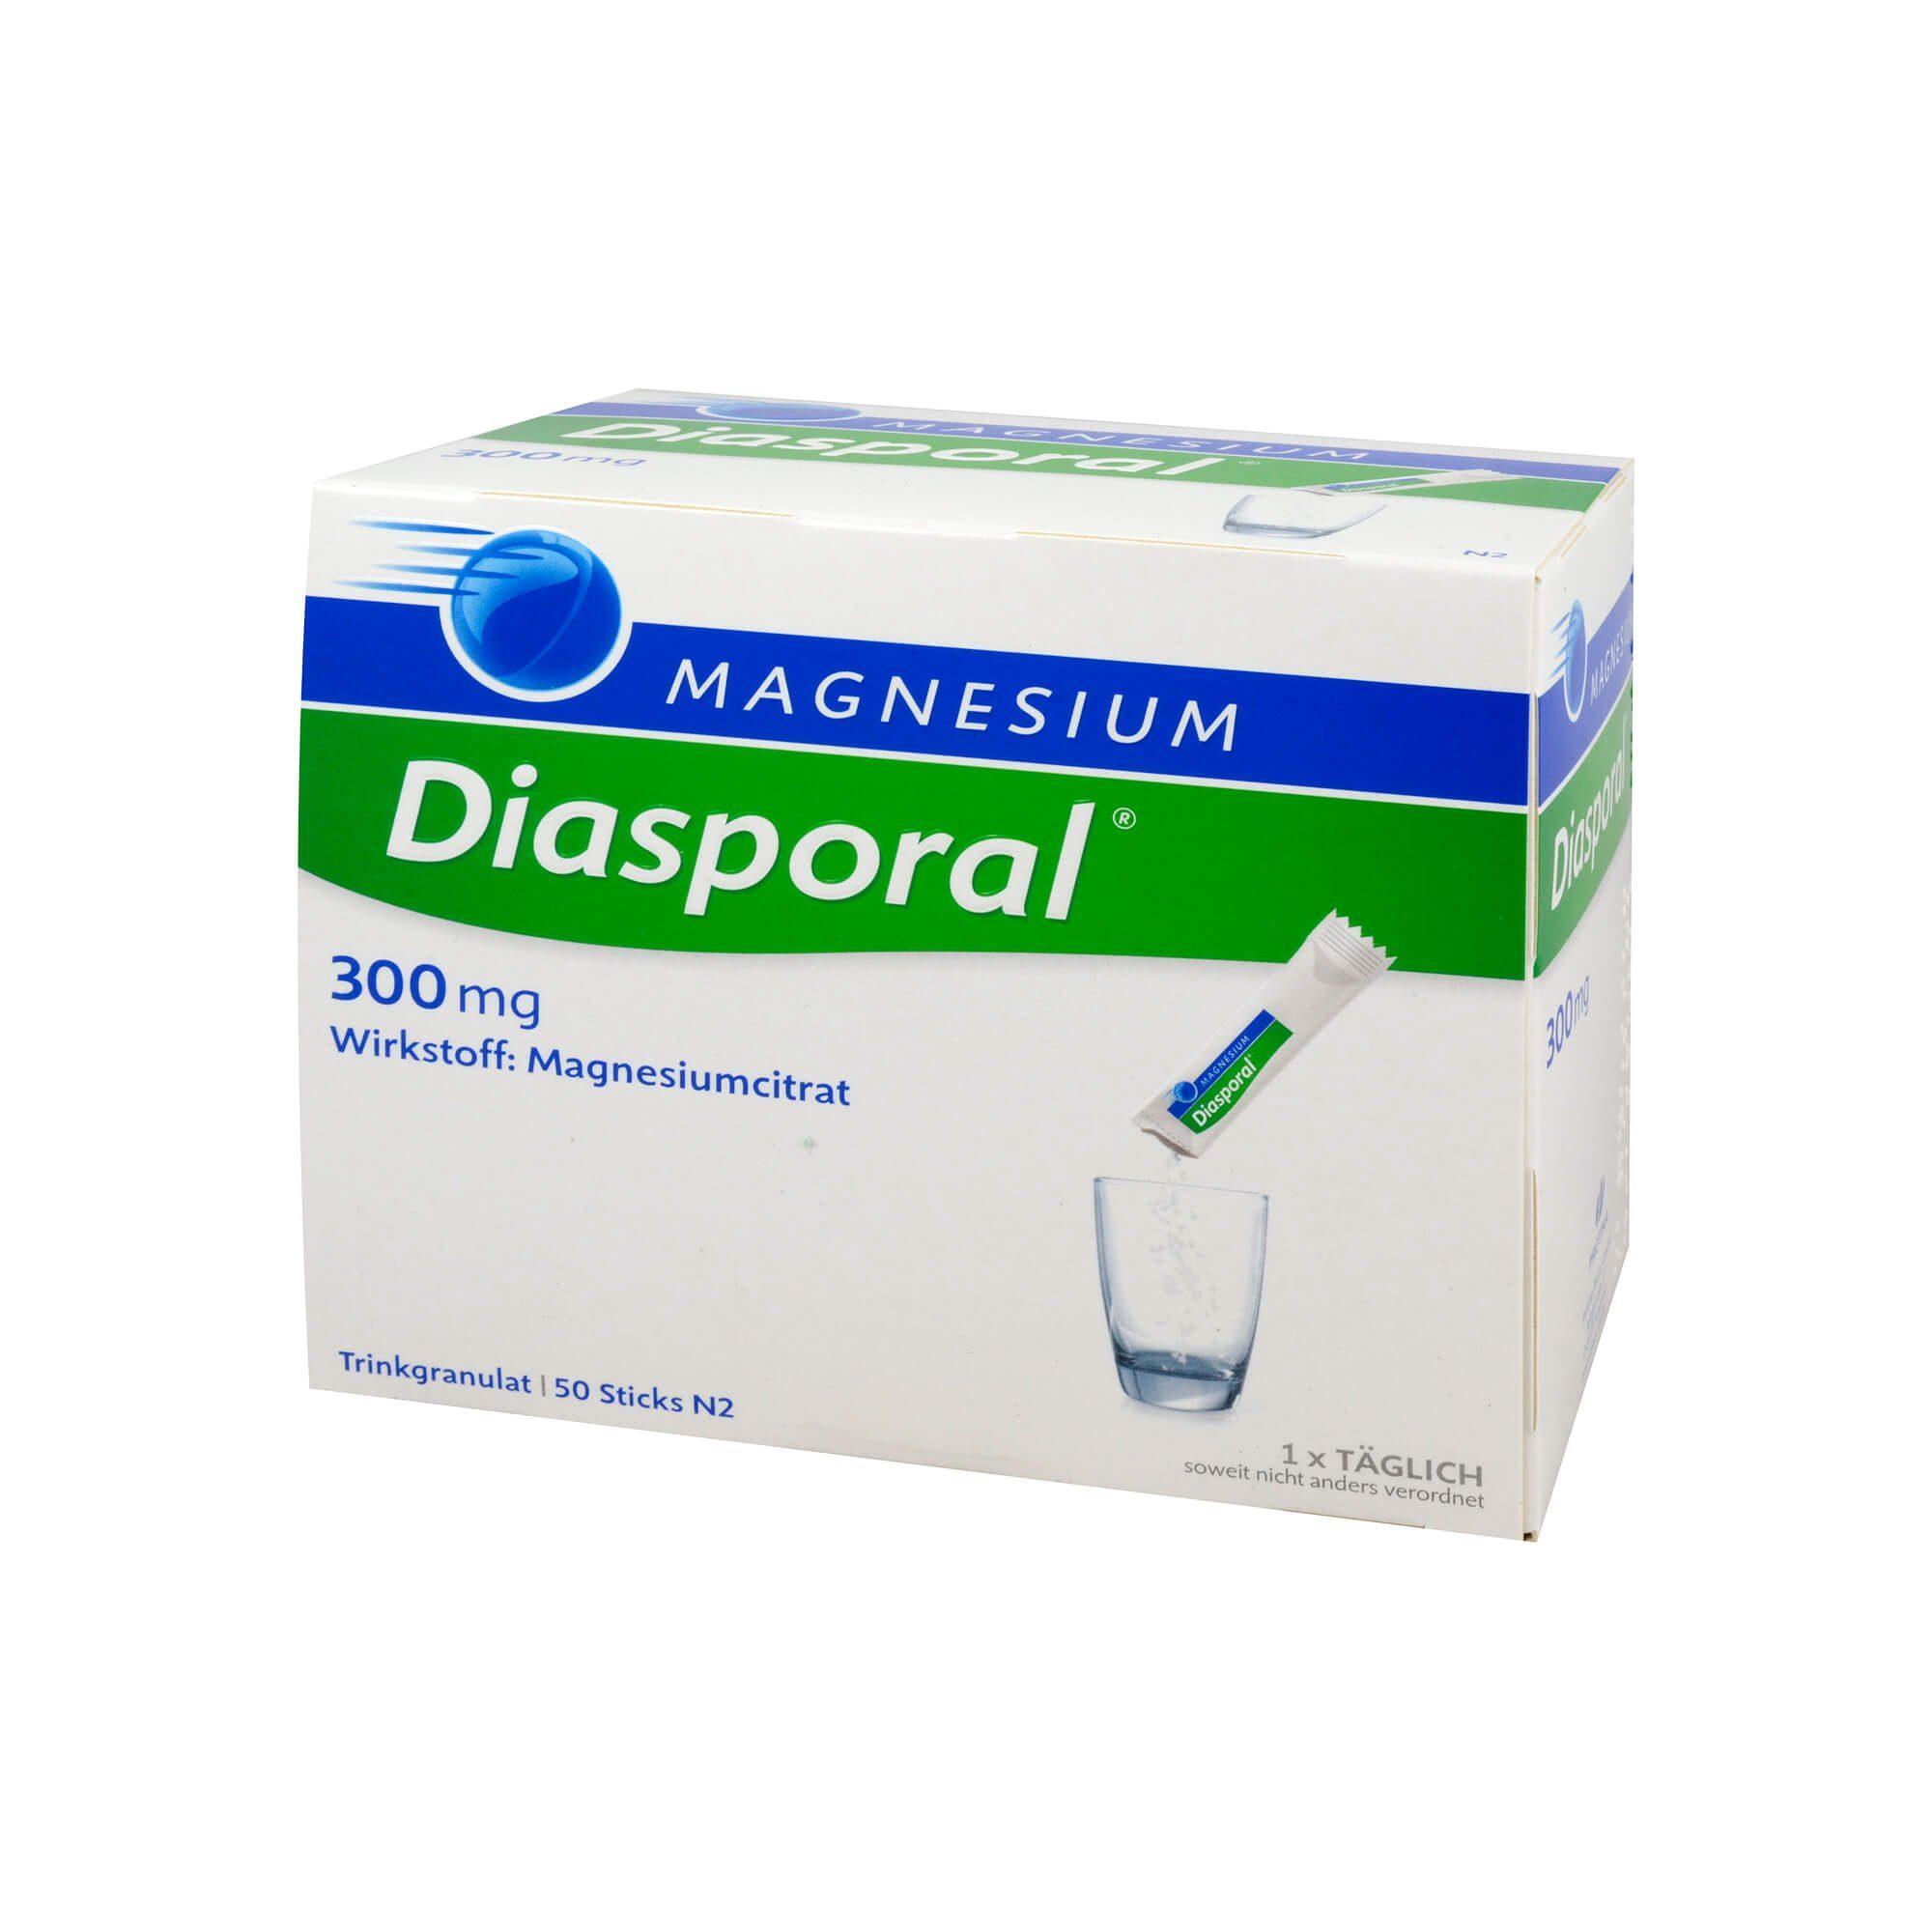 Diasporal Magnesium-Diasporal 300 mg , 50 St